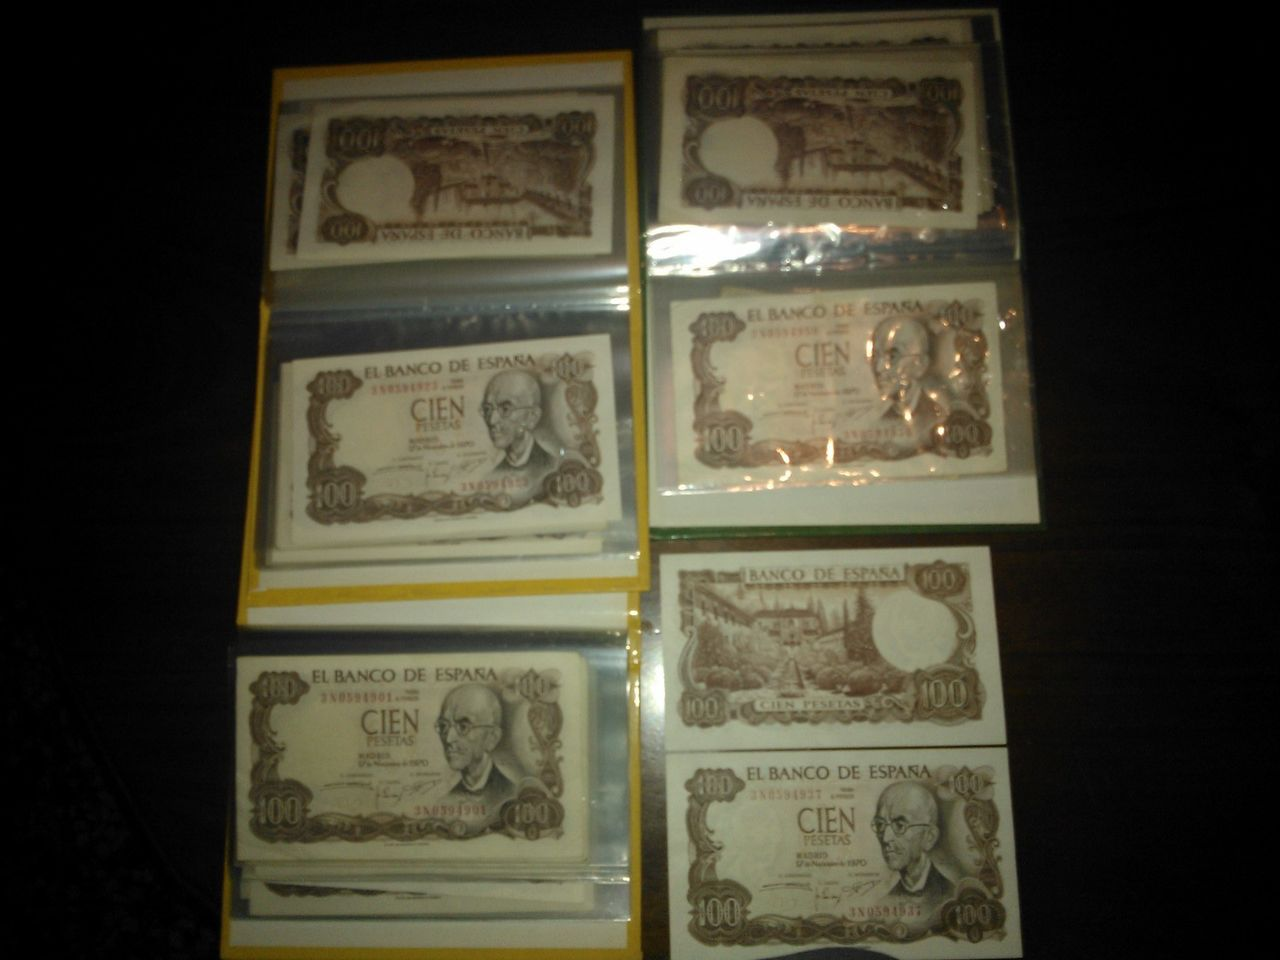 50 billetes correlativos de 100 pesetas de manuel de falla WP_000089